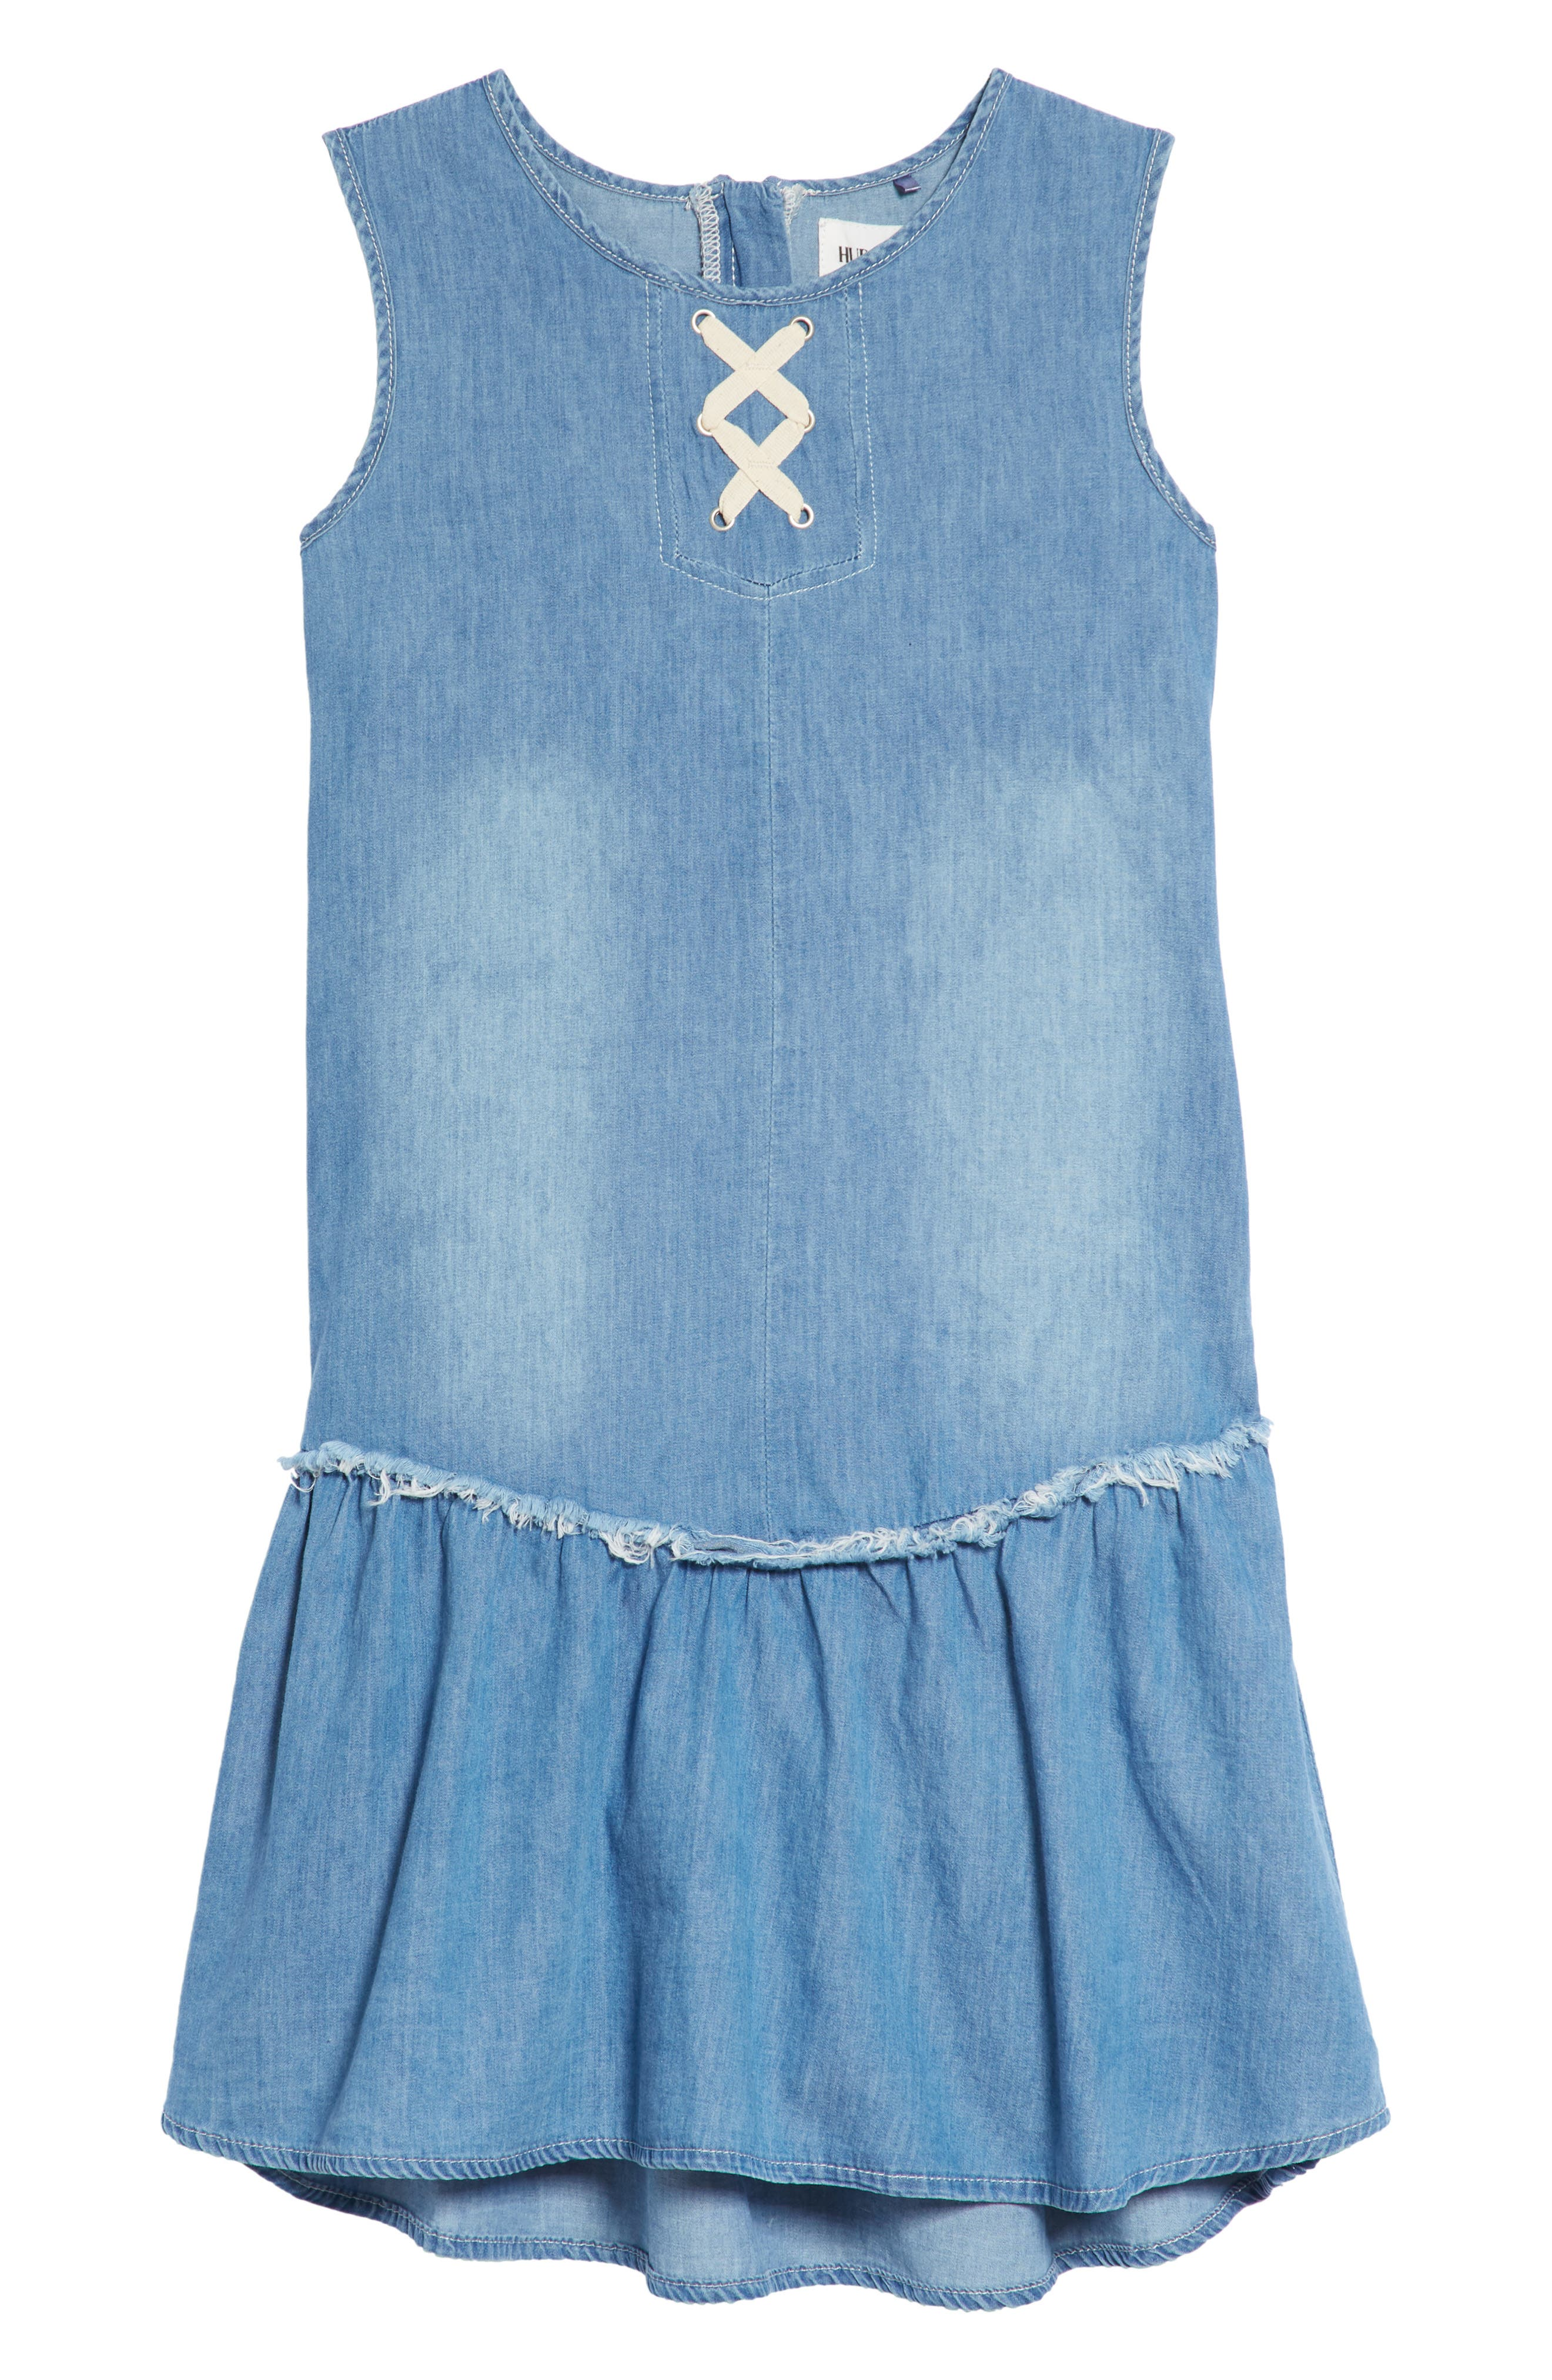 Lulu Lace-Up Chambray Dress,                         Main,                         color, 400